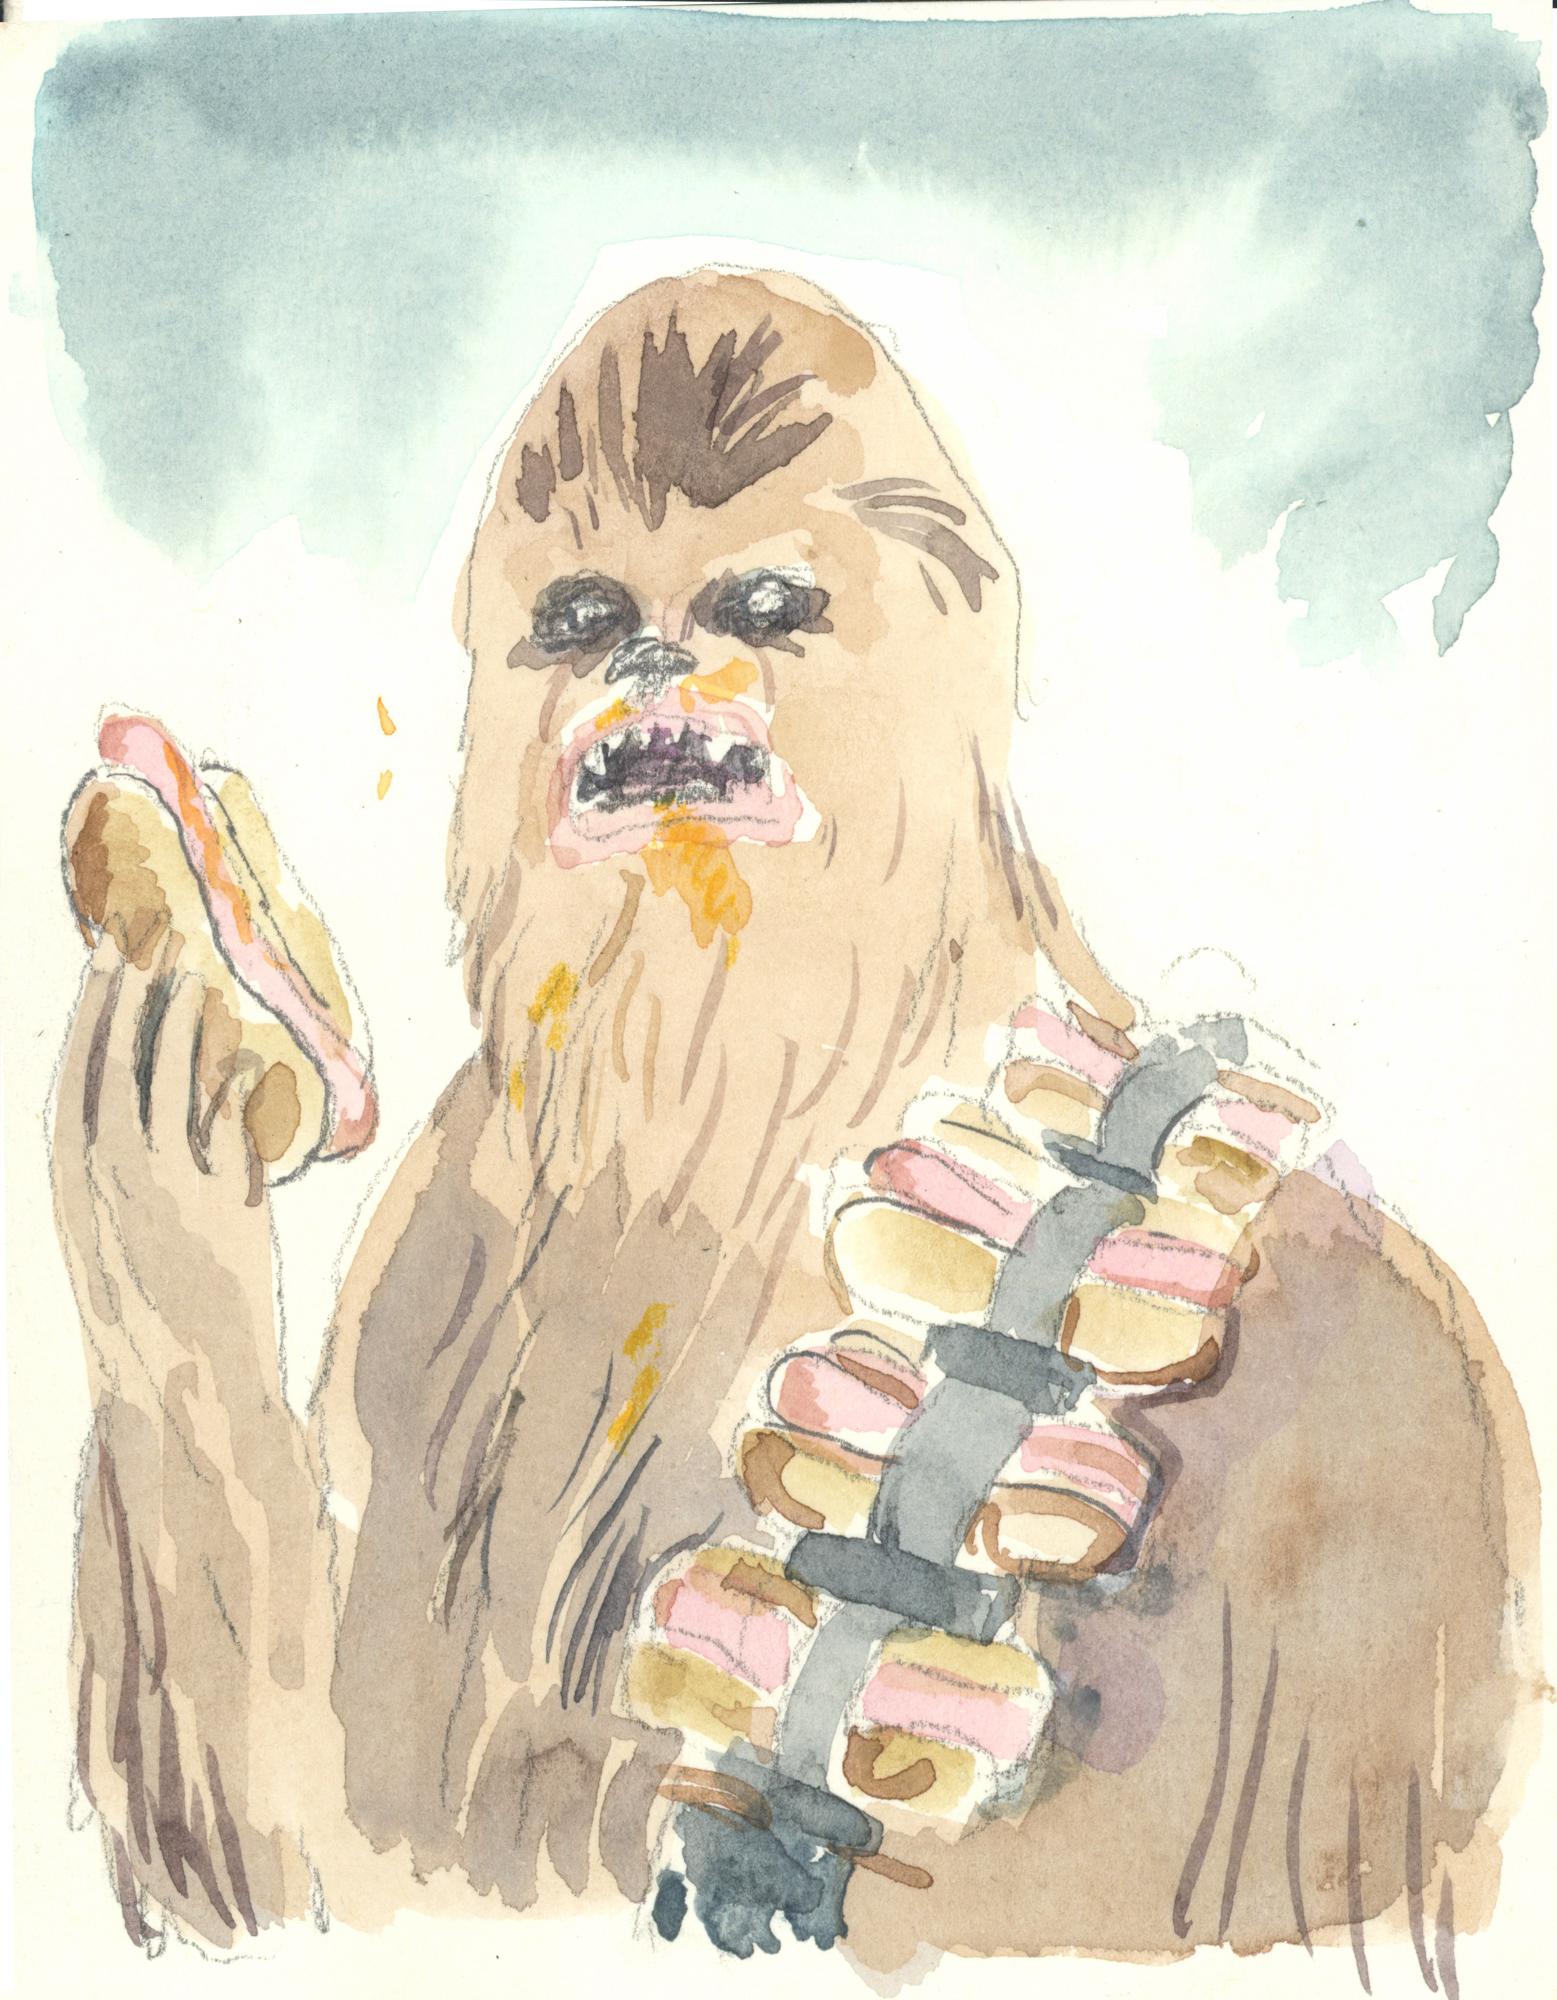 Hot Dog Chewbacca